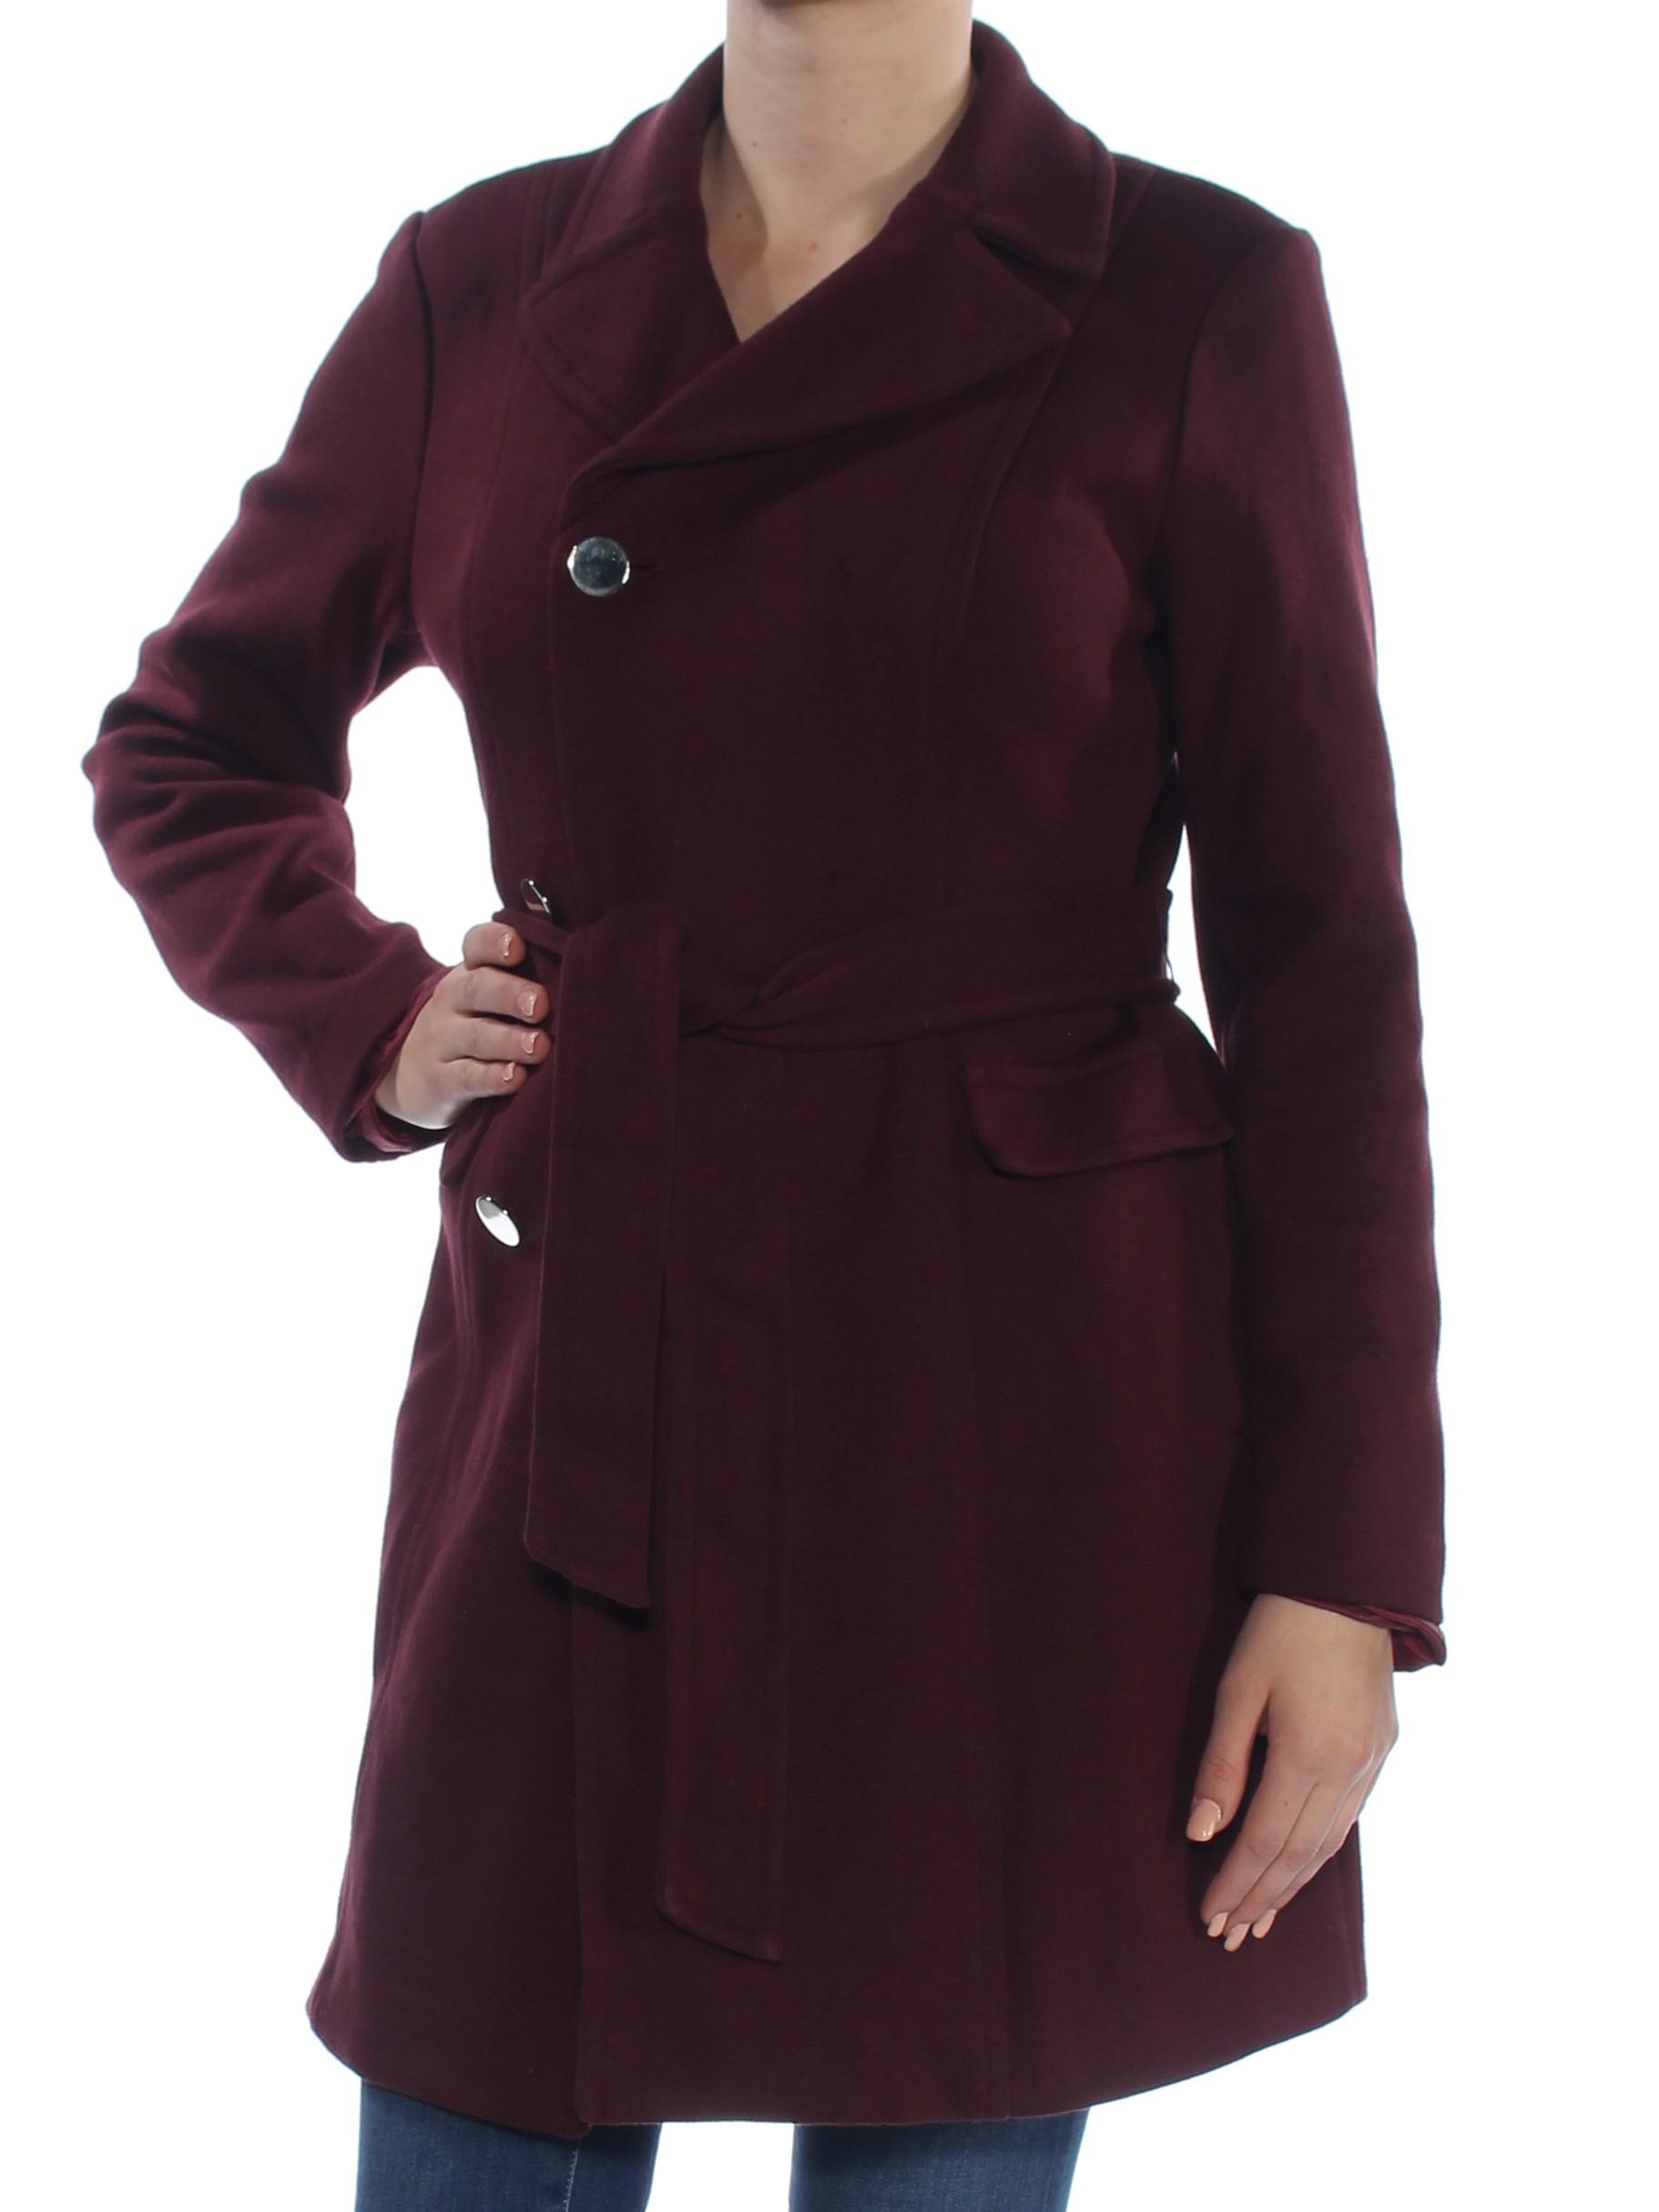 4e8203b0df50b INC  149 Womens New 1272 Burgundy Peacoat Casual Jacket M Plus B+B ...